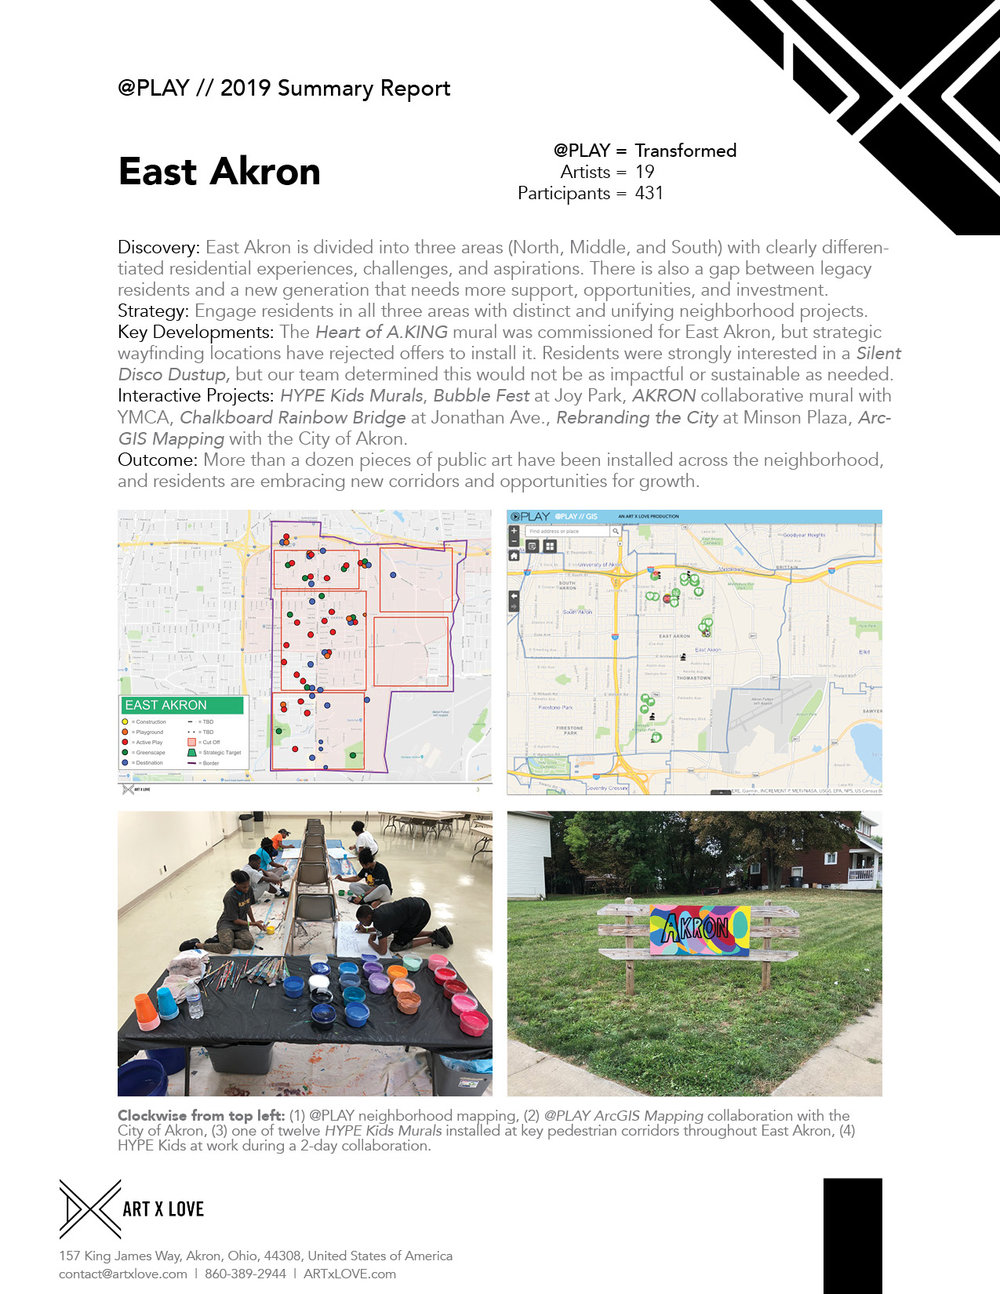 190215_@PLAY_2019_Neighborhood-Pages17.jpg